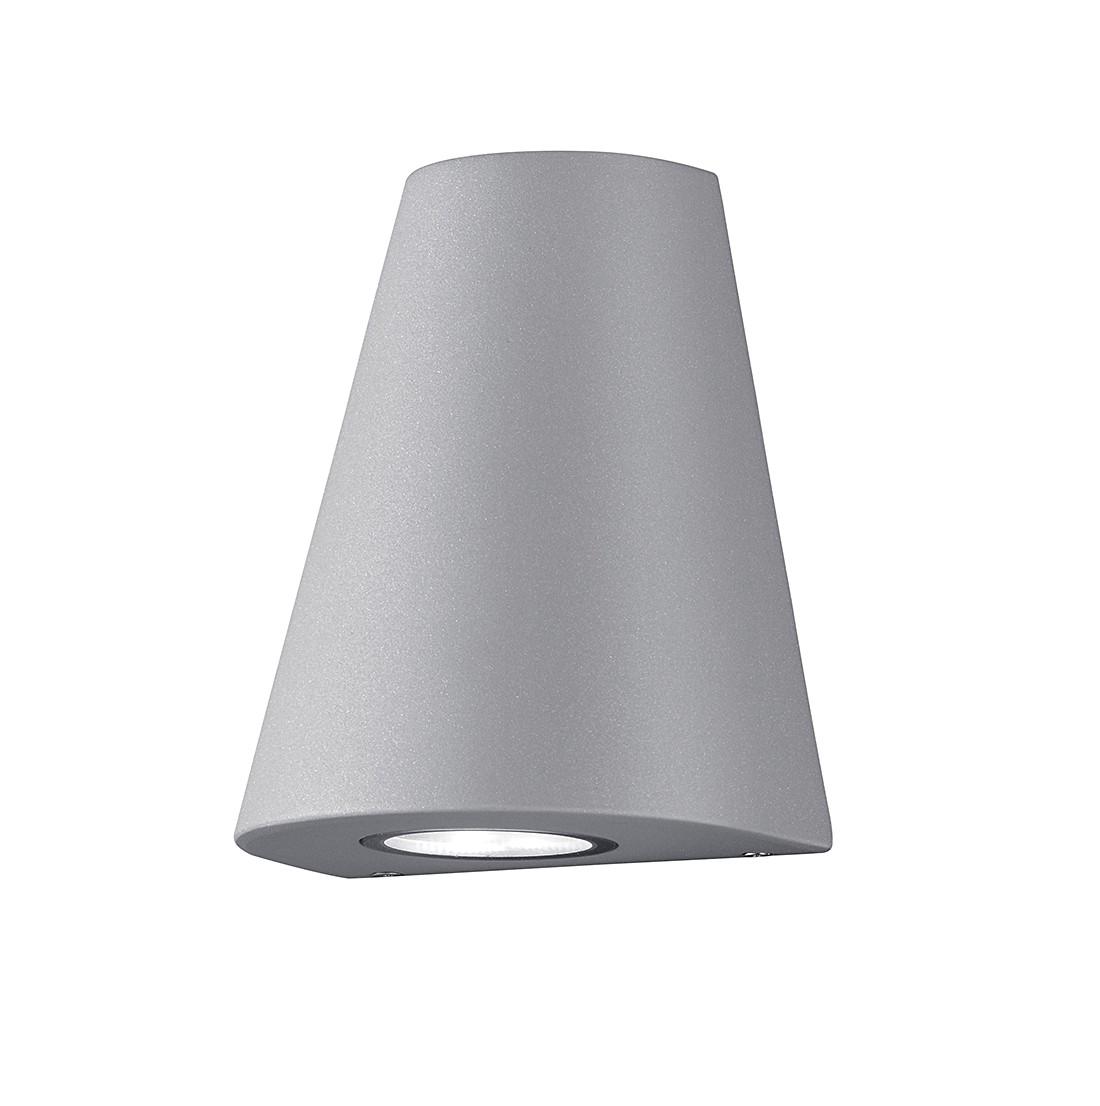 EEK A+, LED-Außenleuchte Niagara 1-flammig - Aluminium Kunststoff - Silber, Trio